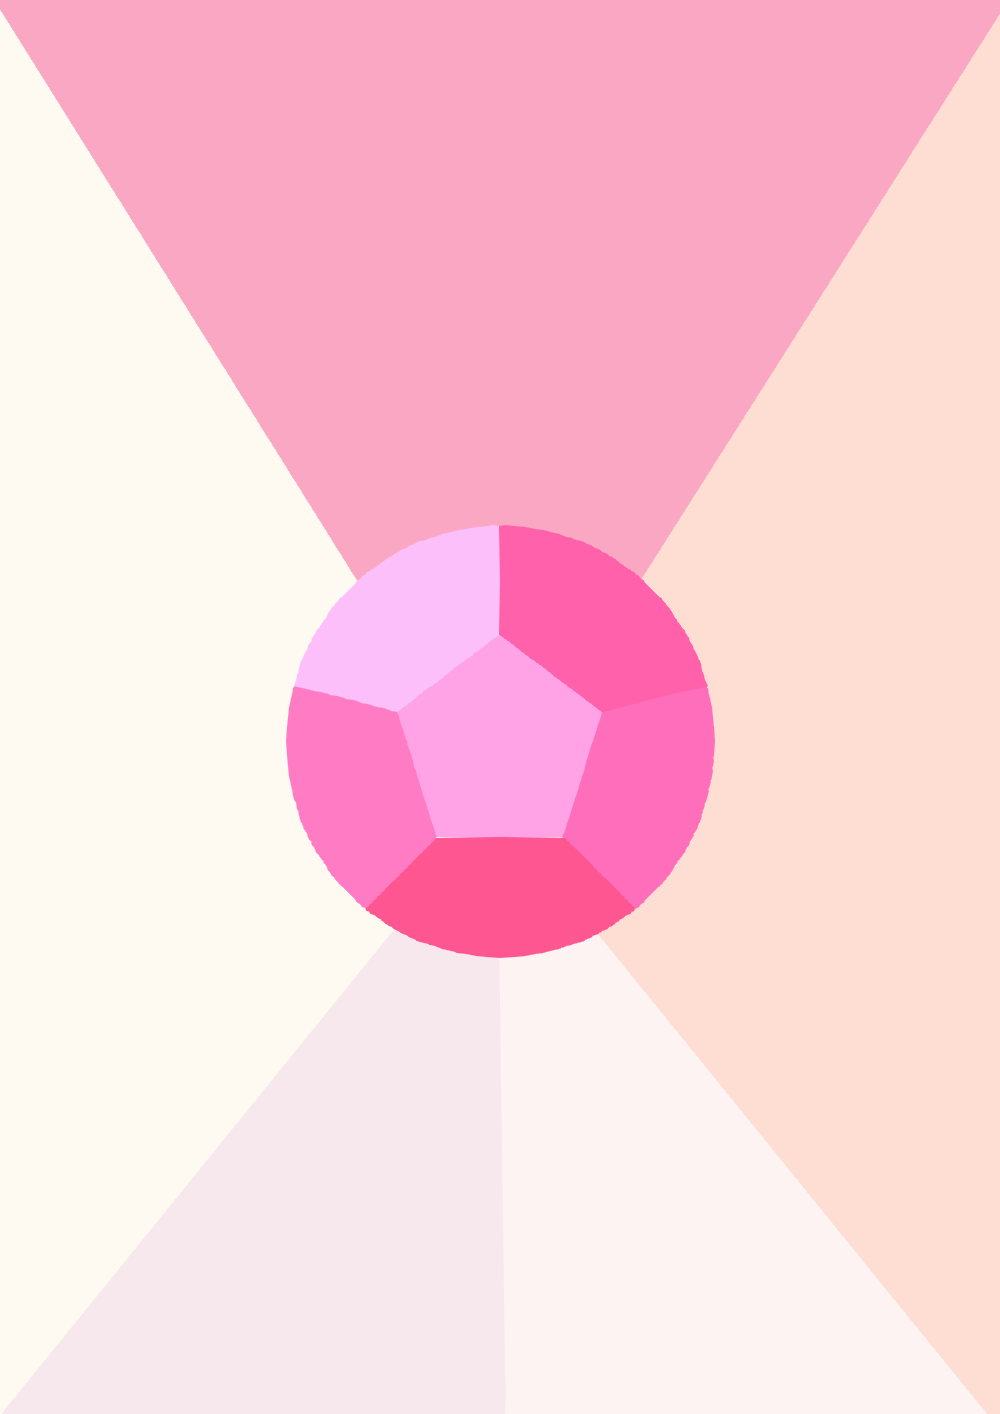 Su Minimal Wallpaper Rose Quartz By Musictechgirl1 On